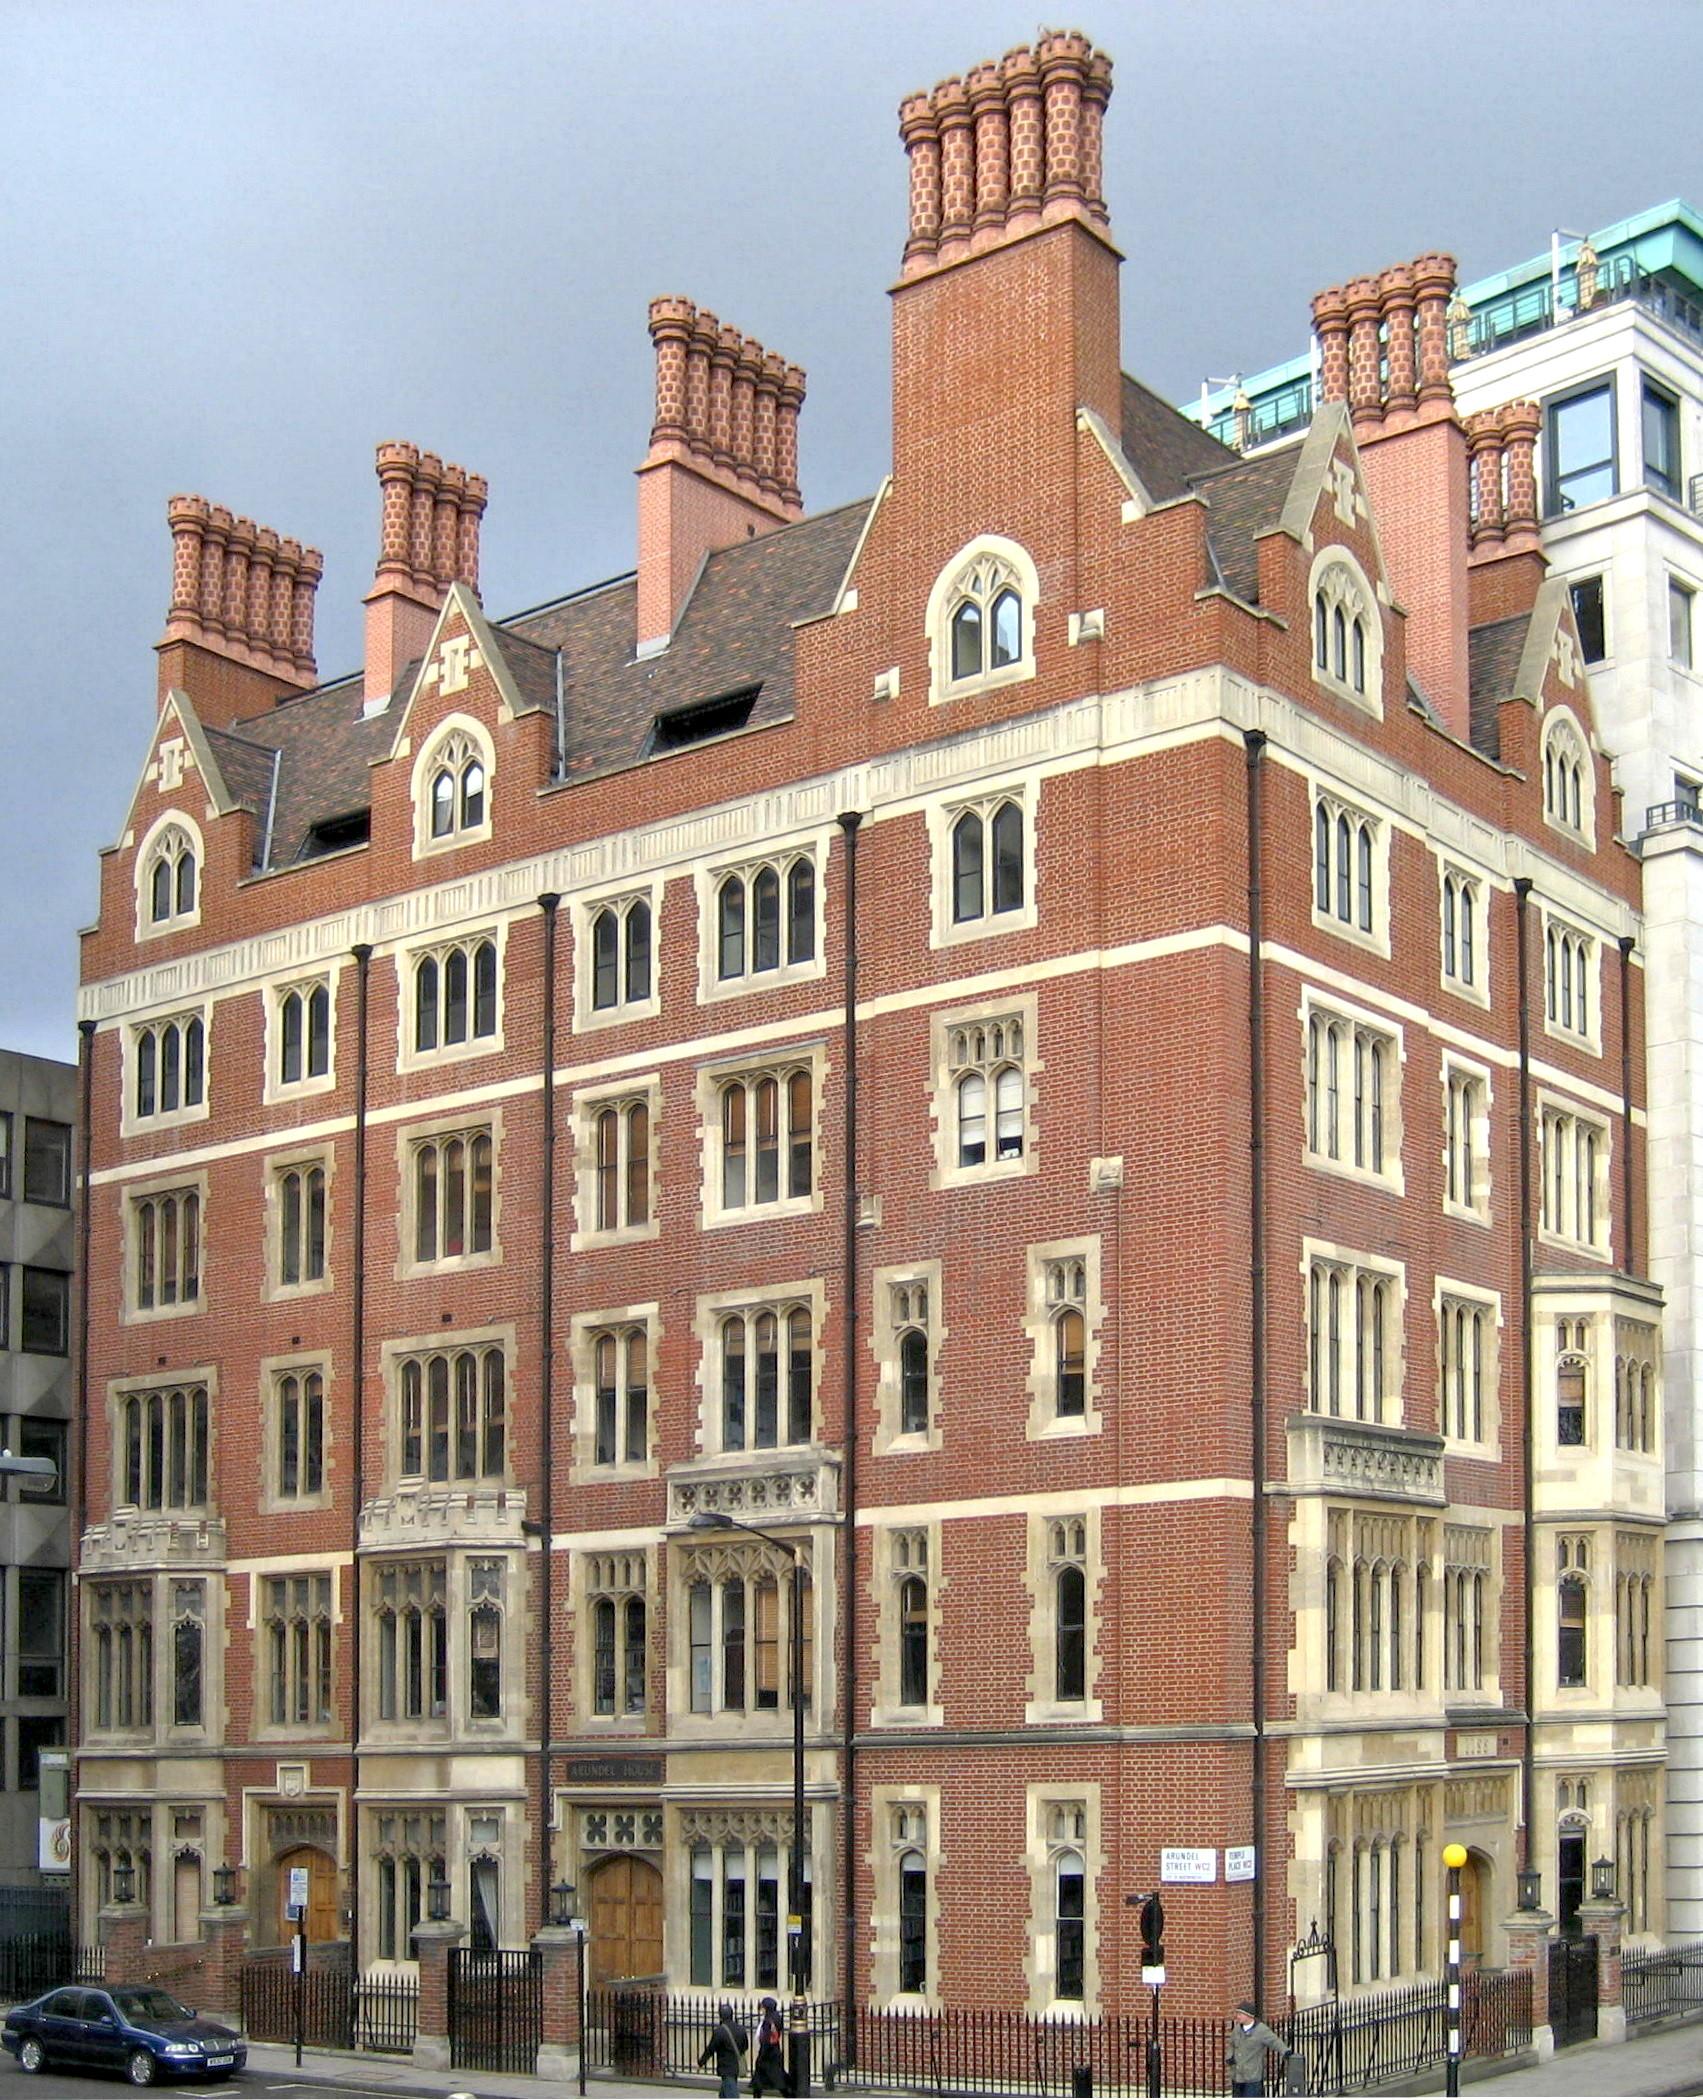 [[Arundel House]], [[Temple, London|Temple]], London